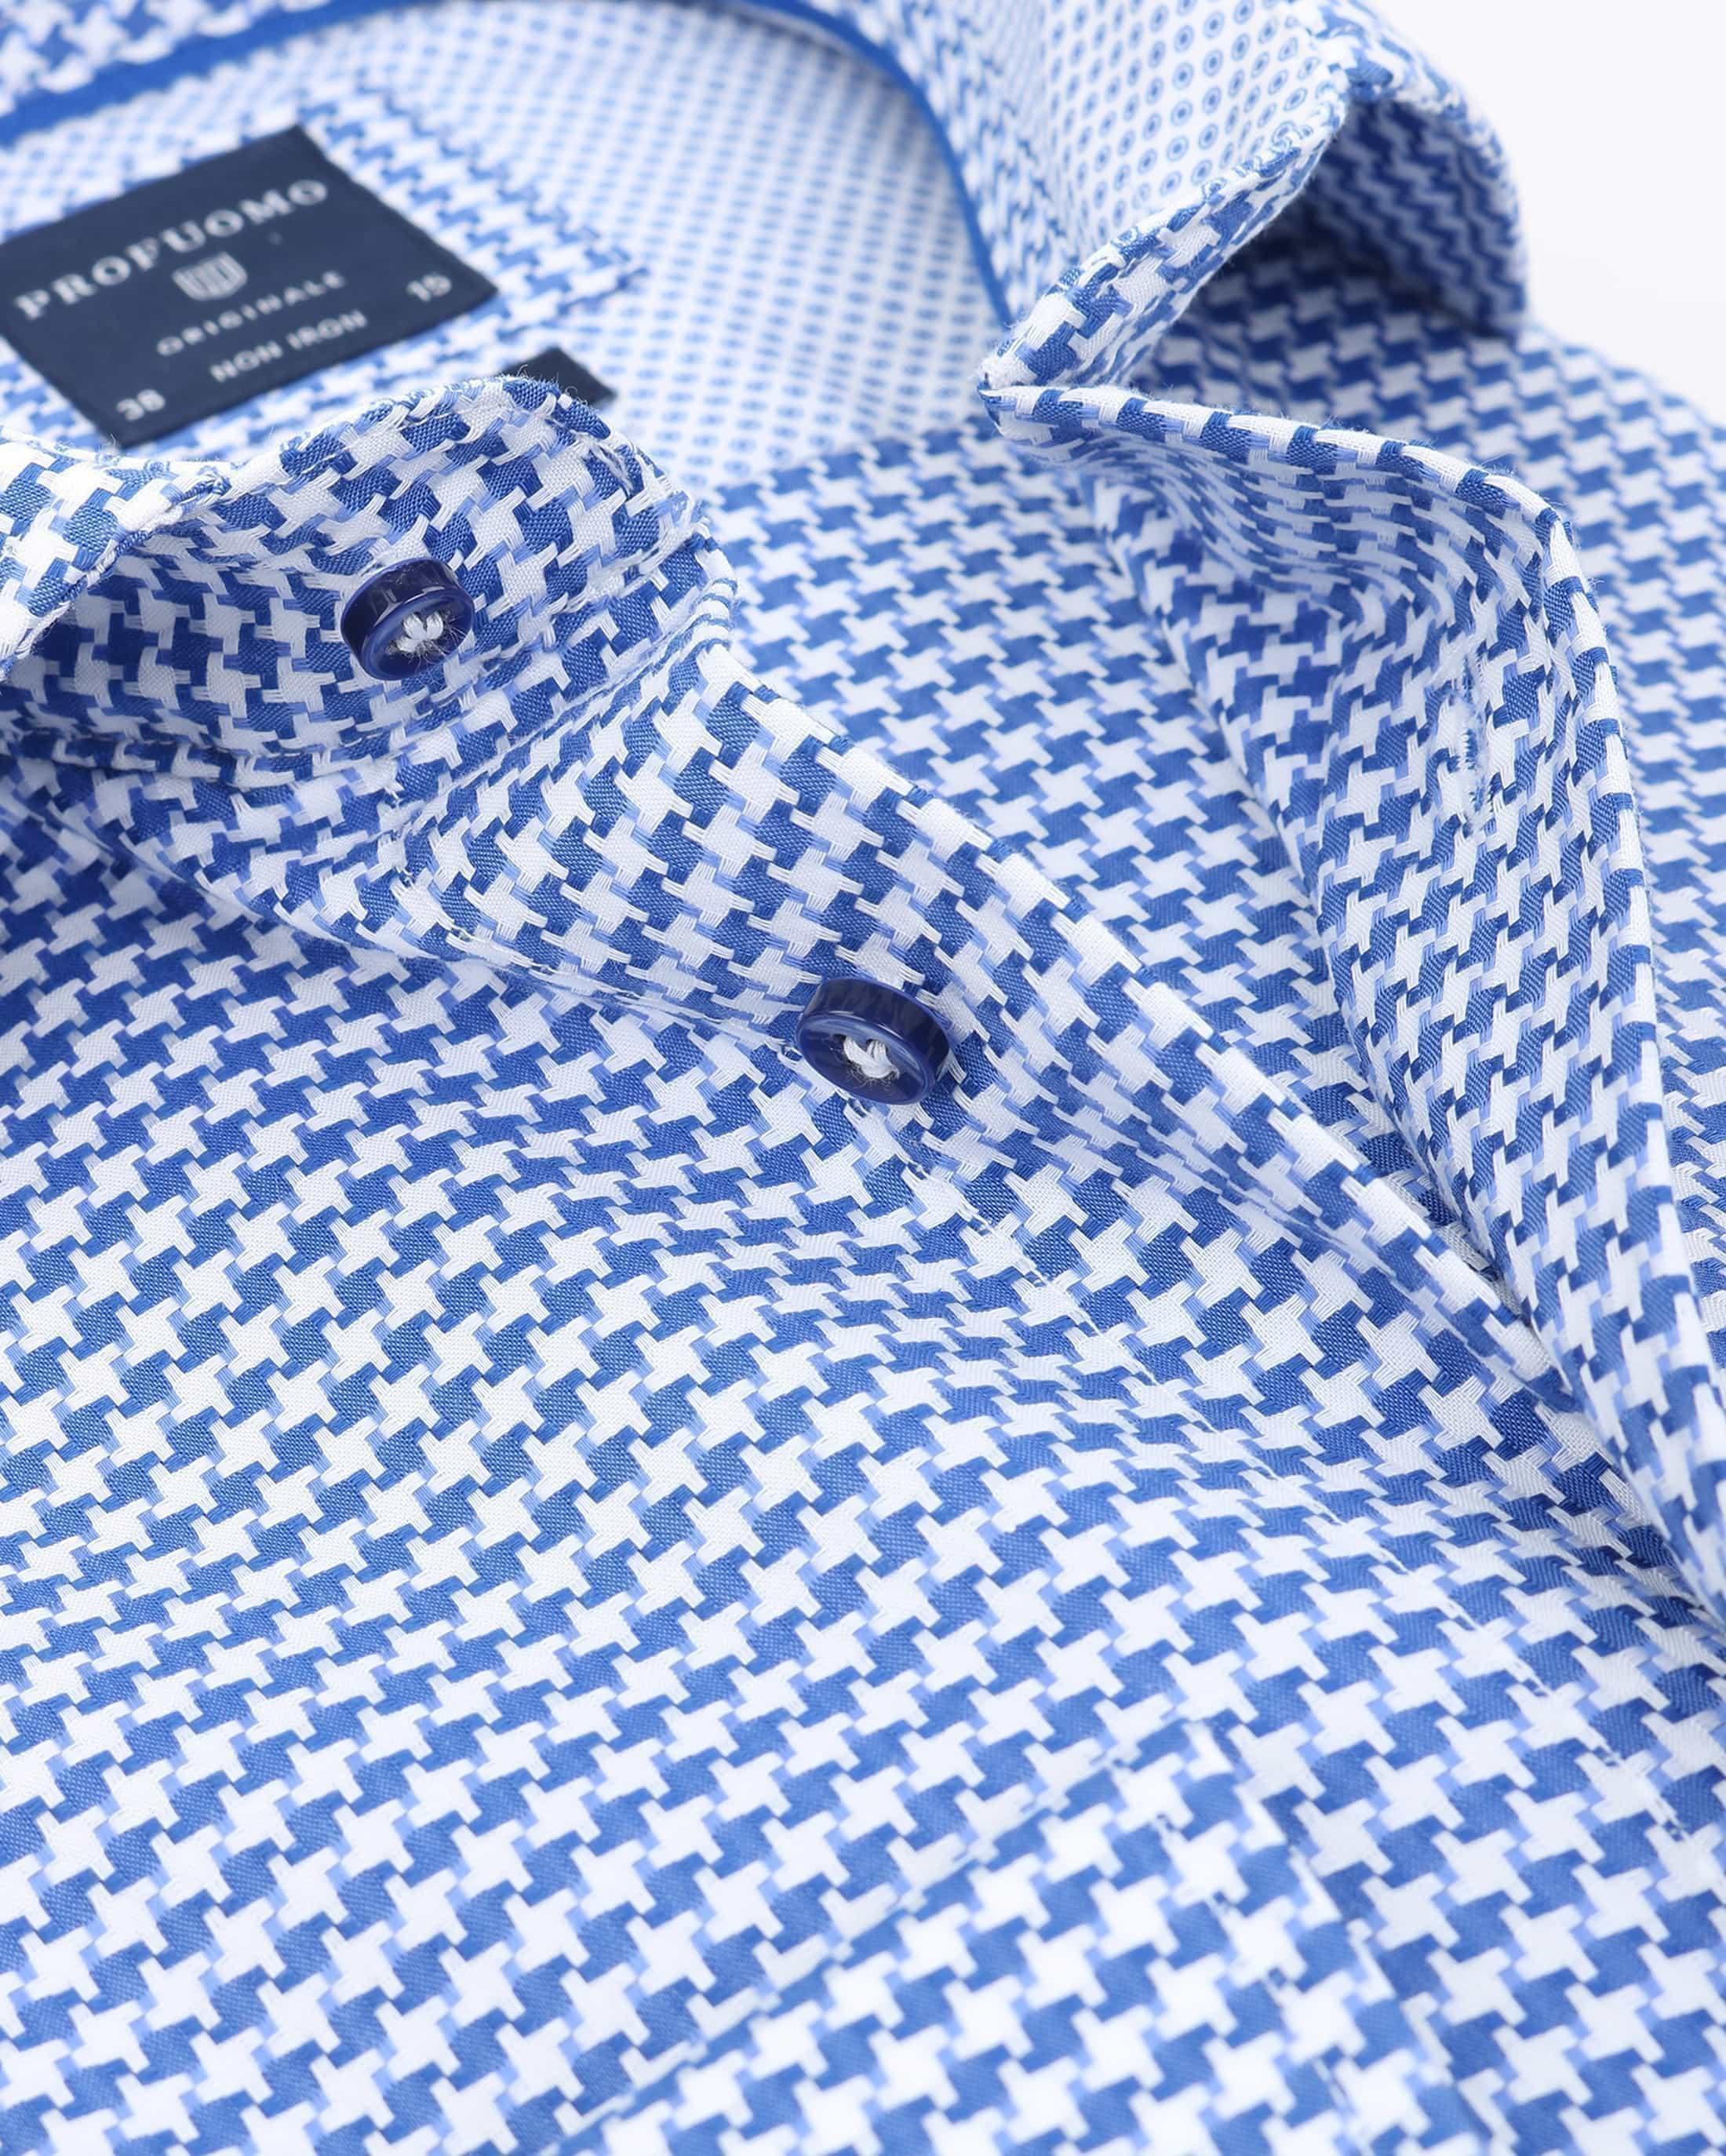 Profuomo Slim Fit Overhemd Blauw Wit foto 2